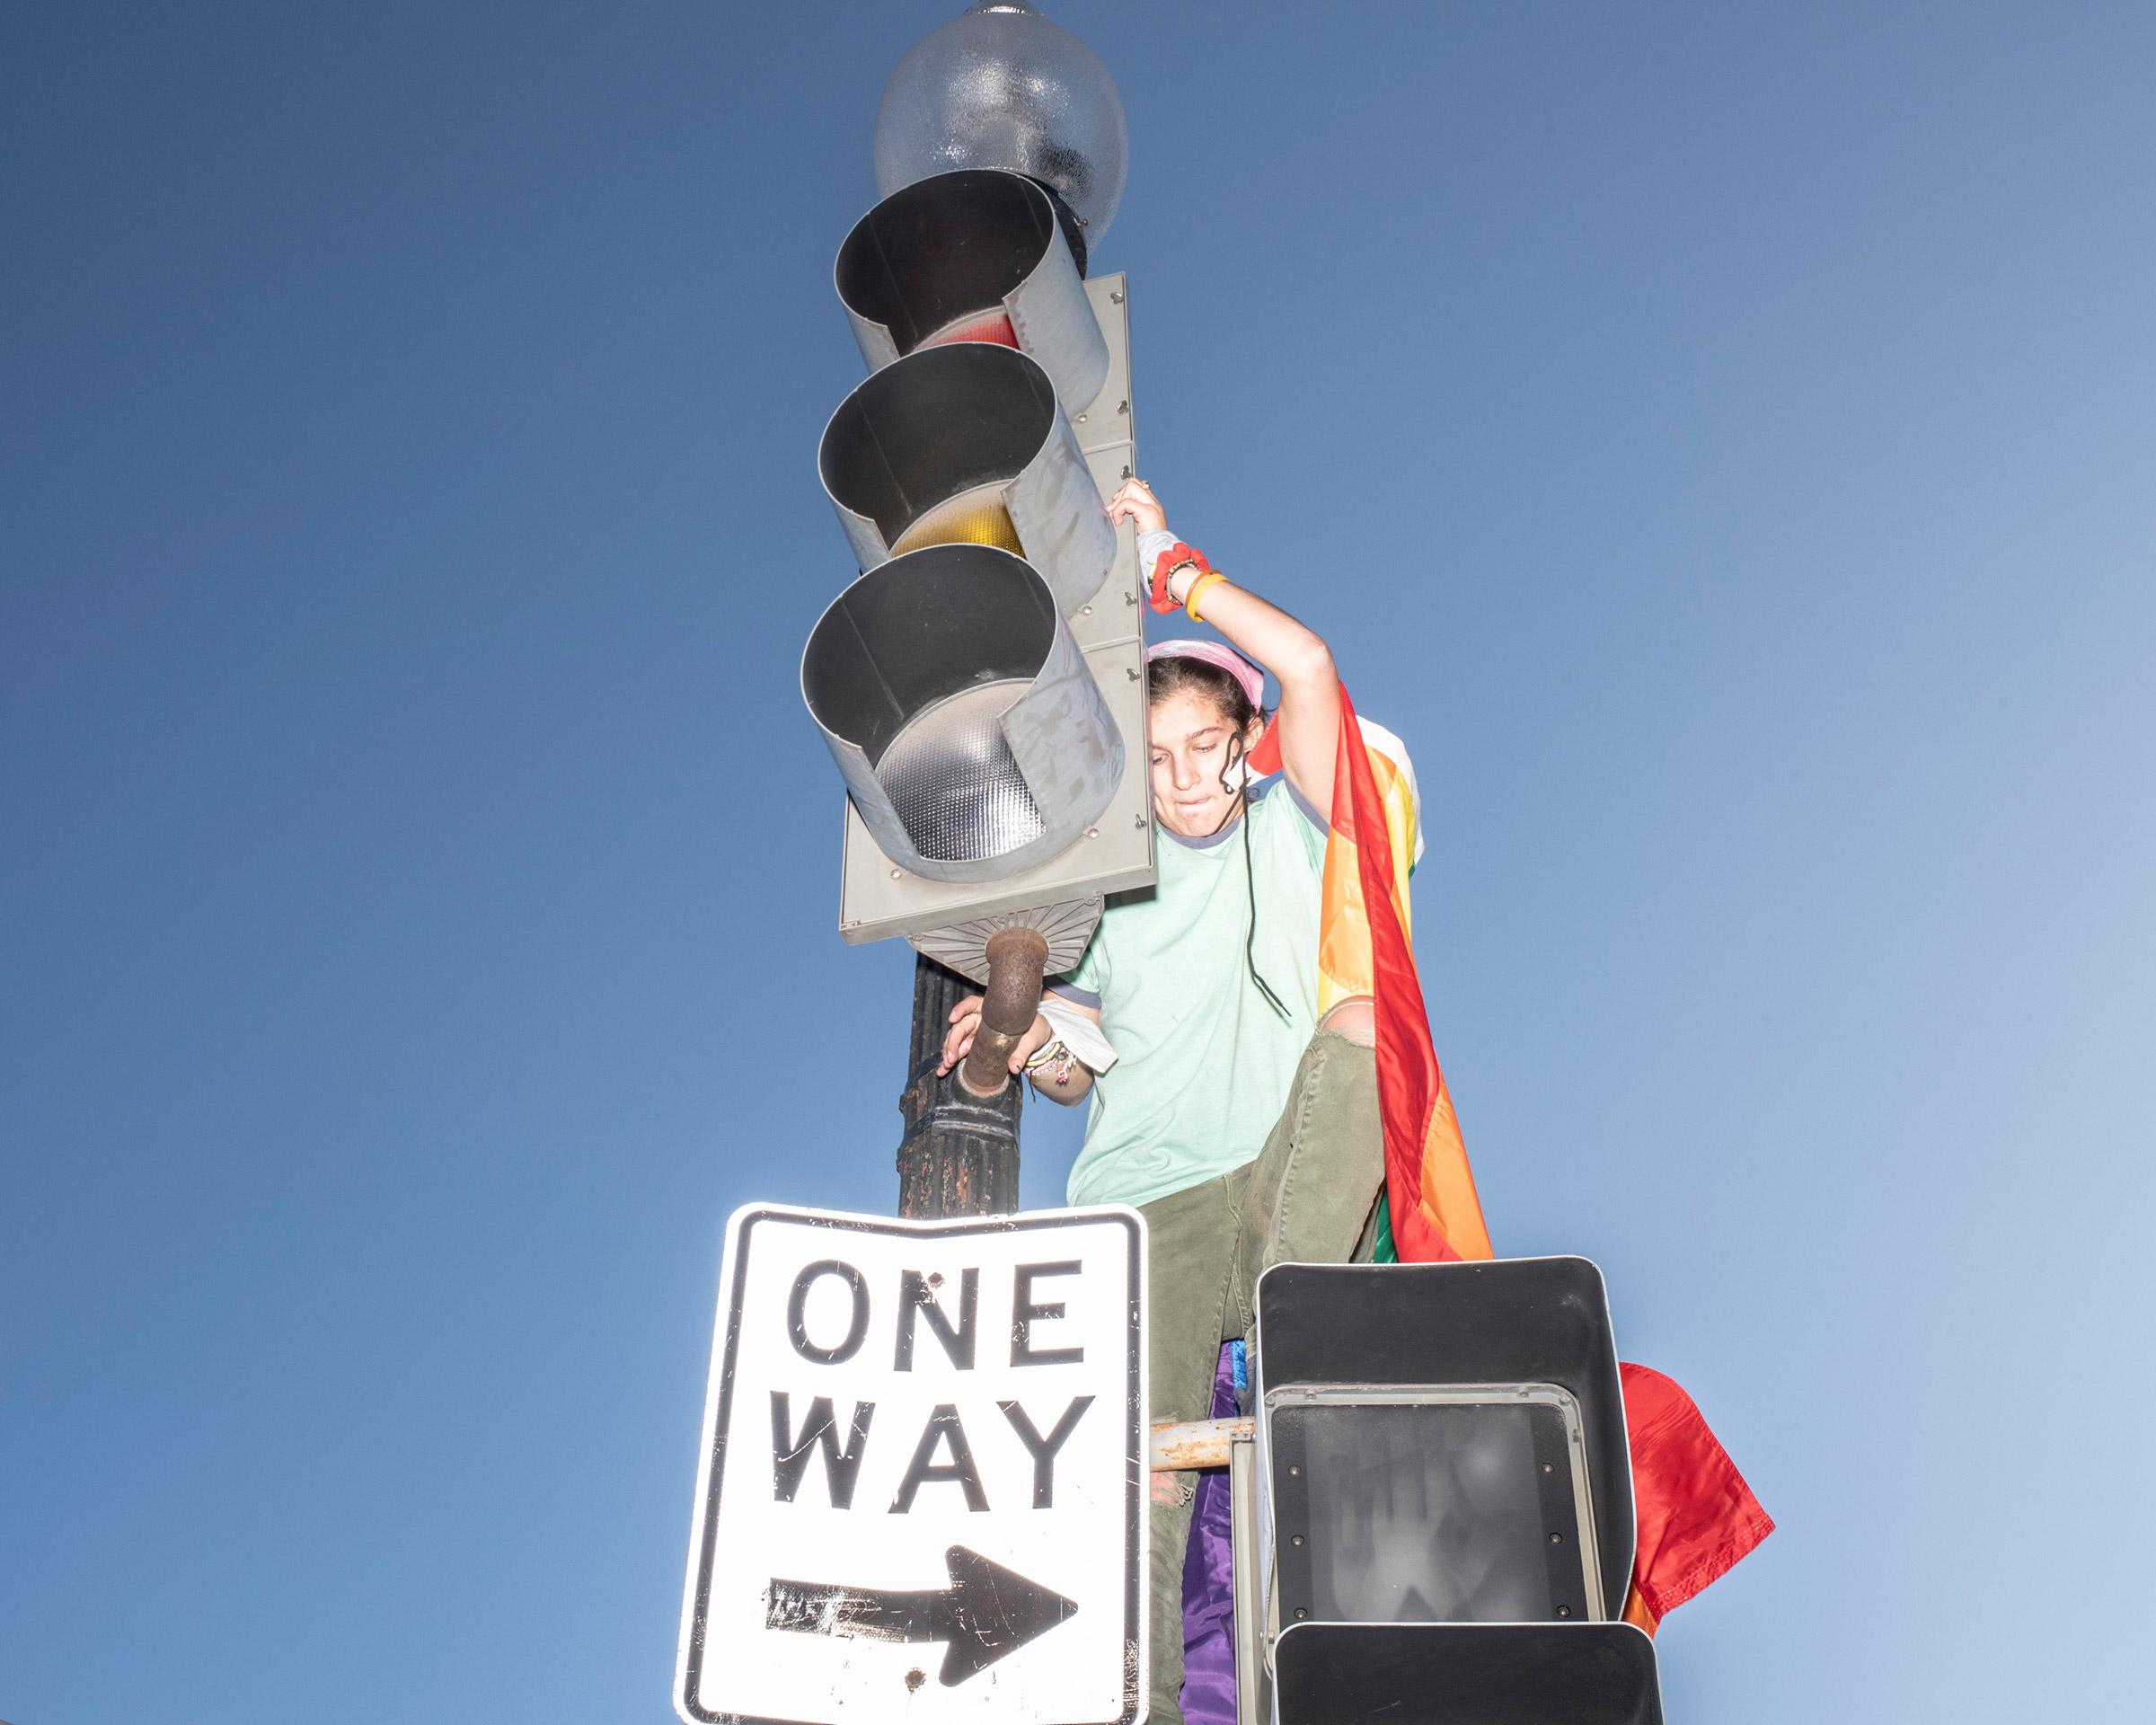 A reveler climbs a traffic light on Black Lives Matter Plaza while celebrating in Washington, D.C., on Nov. 7.